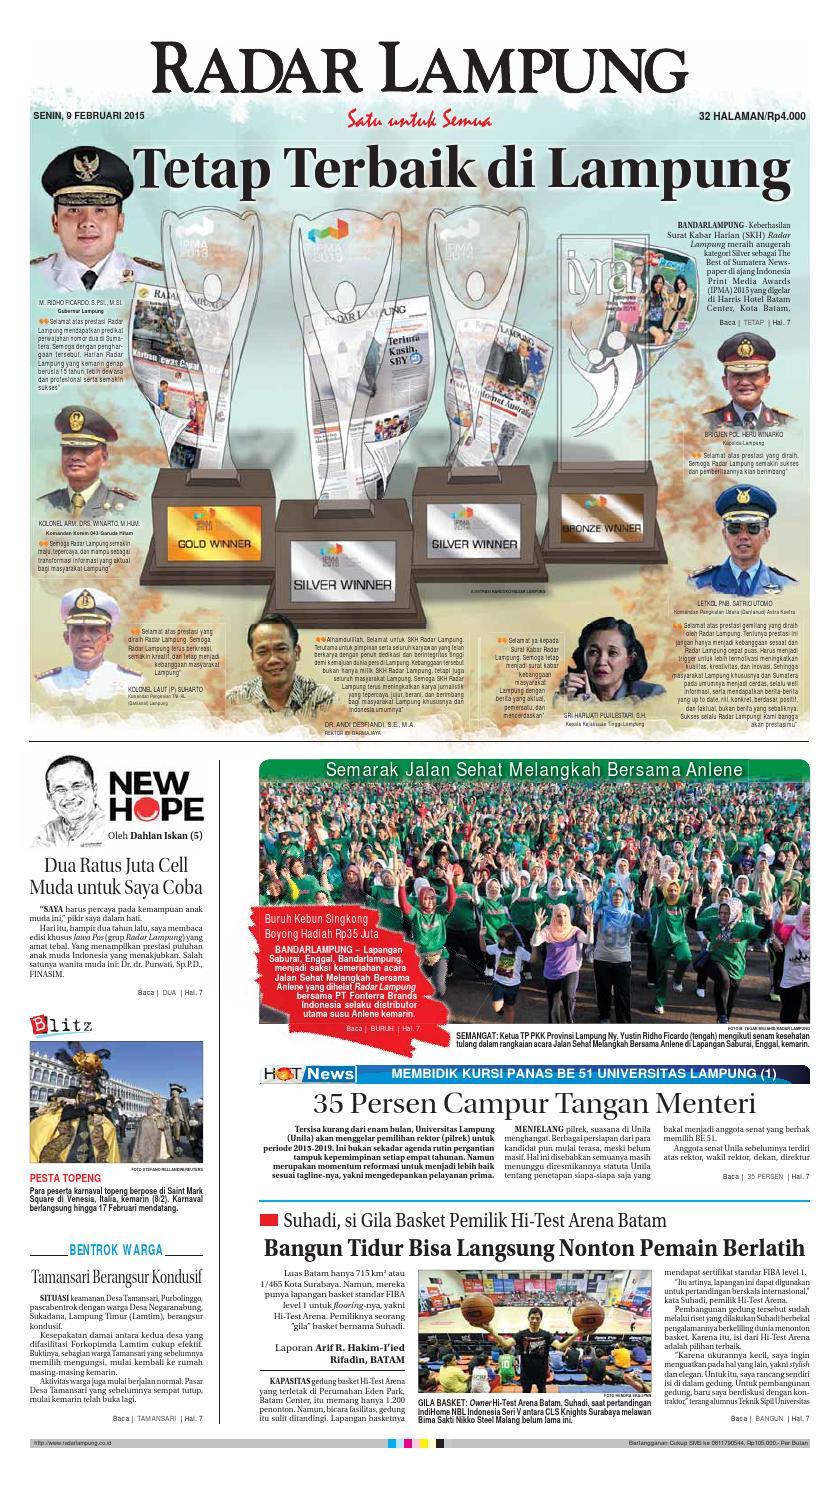 Jual Murah Giwang Emas Khas Bali By Salon Mega Update 2018 Tcash Vaganza 17 Botol Minum Olahraga Discovery 750ml Hitam Radar Lampung Senin 9 Februari 2015 Ayep Kancee Issuu